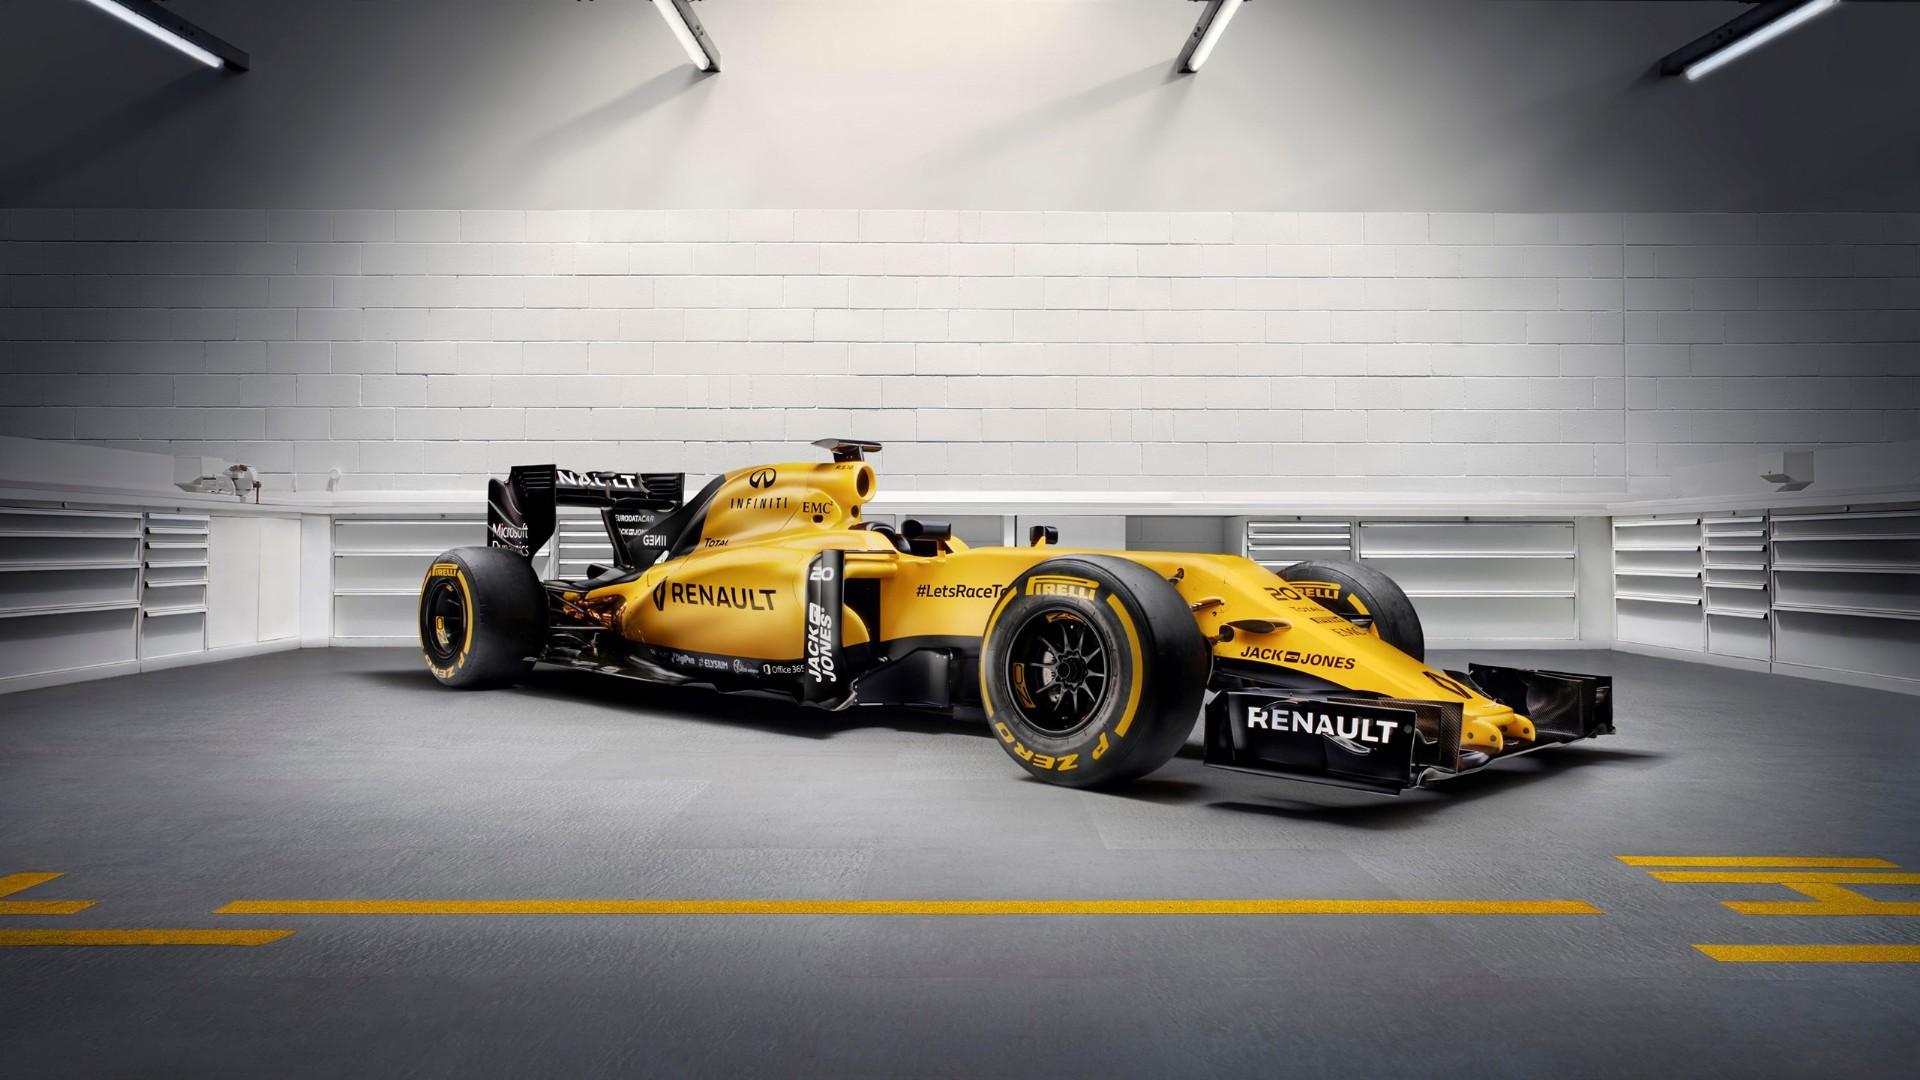 F1 Renault wallpaper